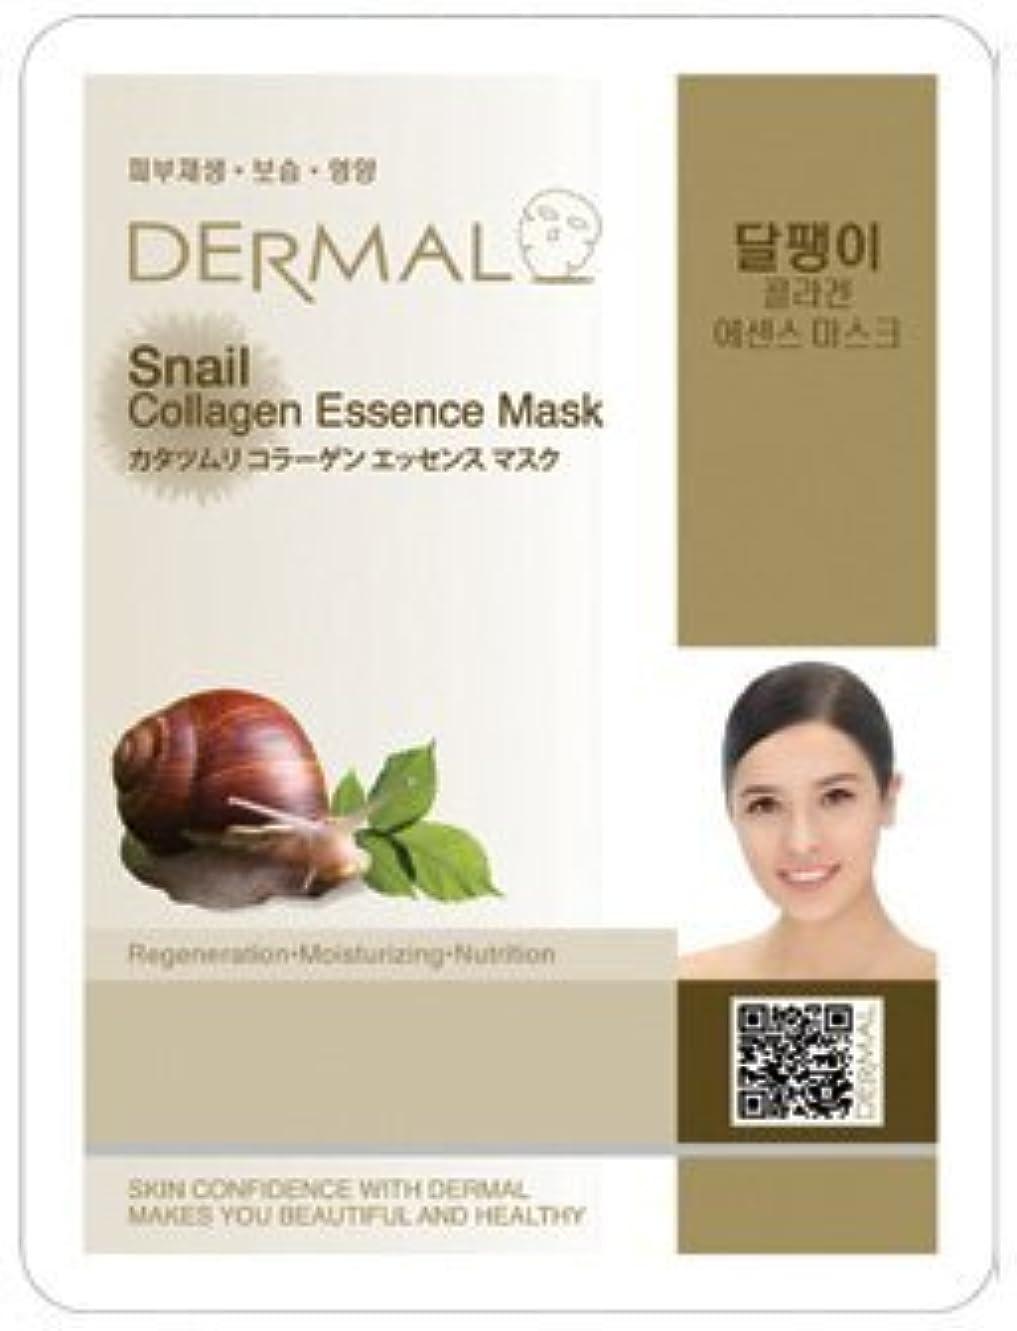 DERMAL(ダーマル) カタツムリ フェイス パック(シートマスク) 100枚セット